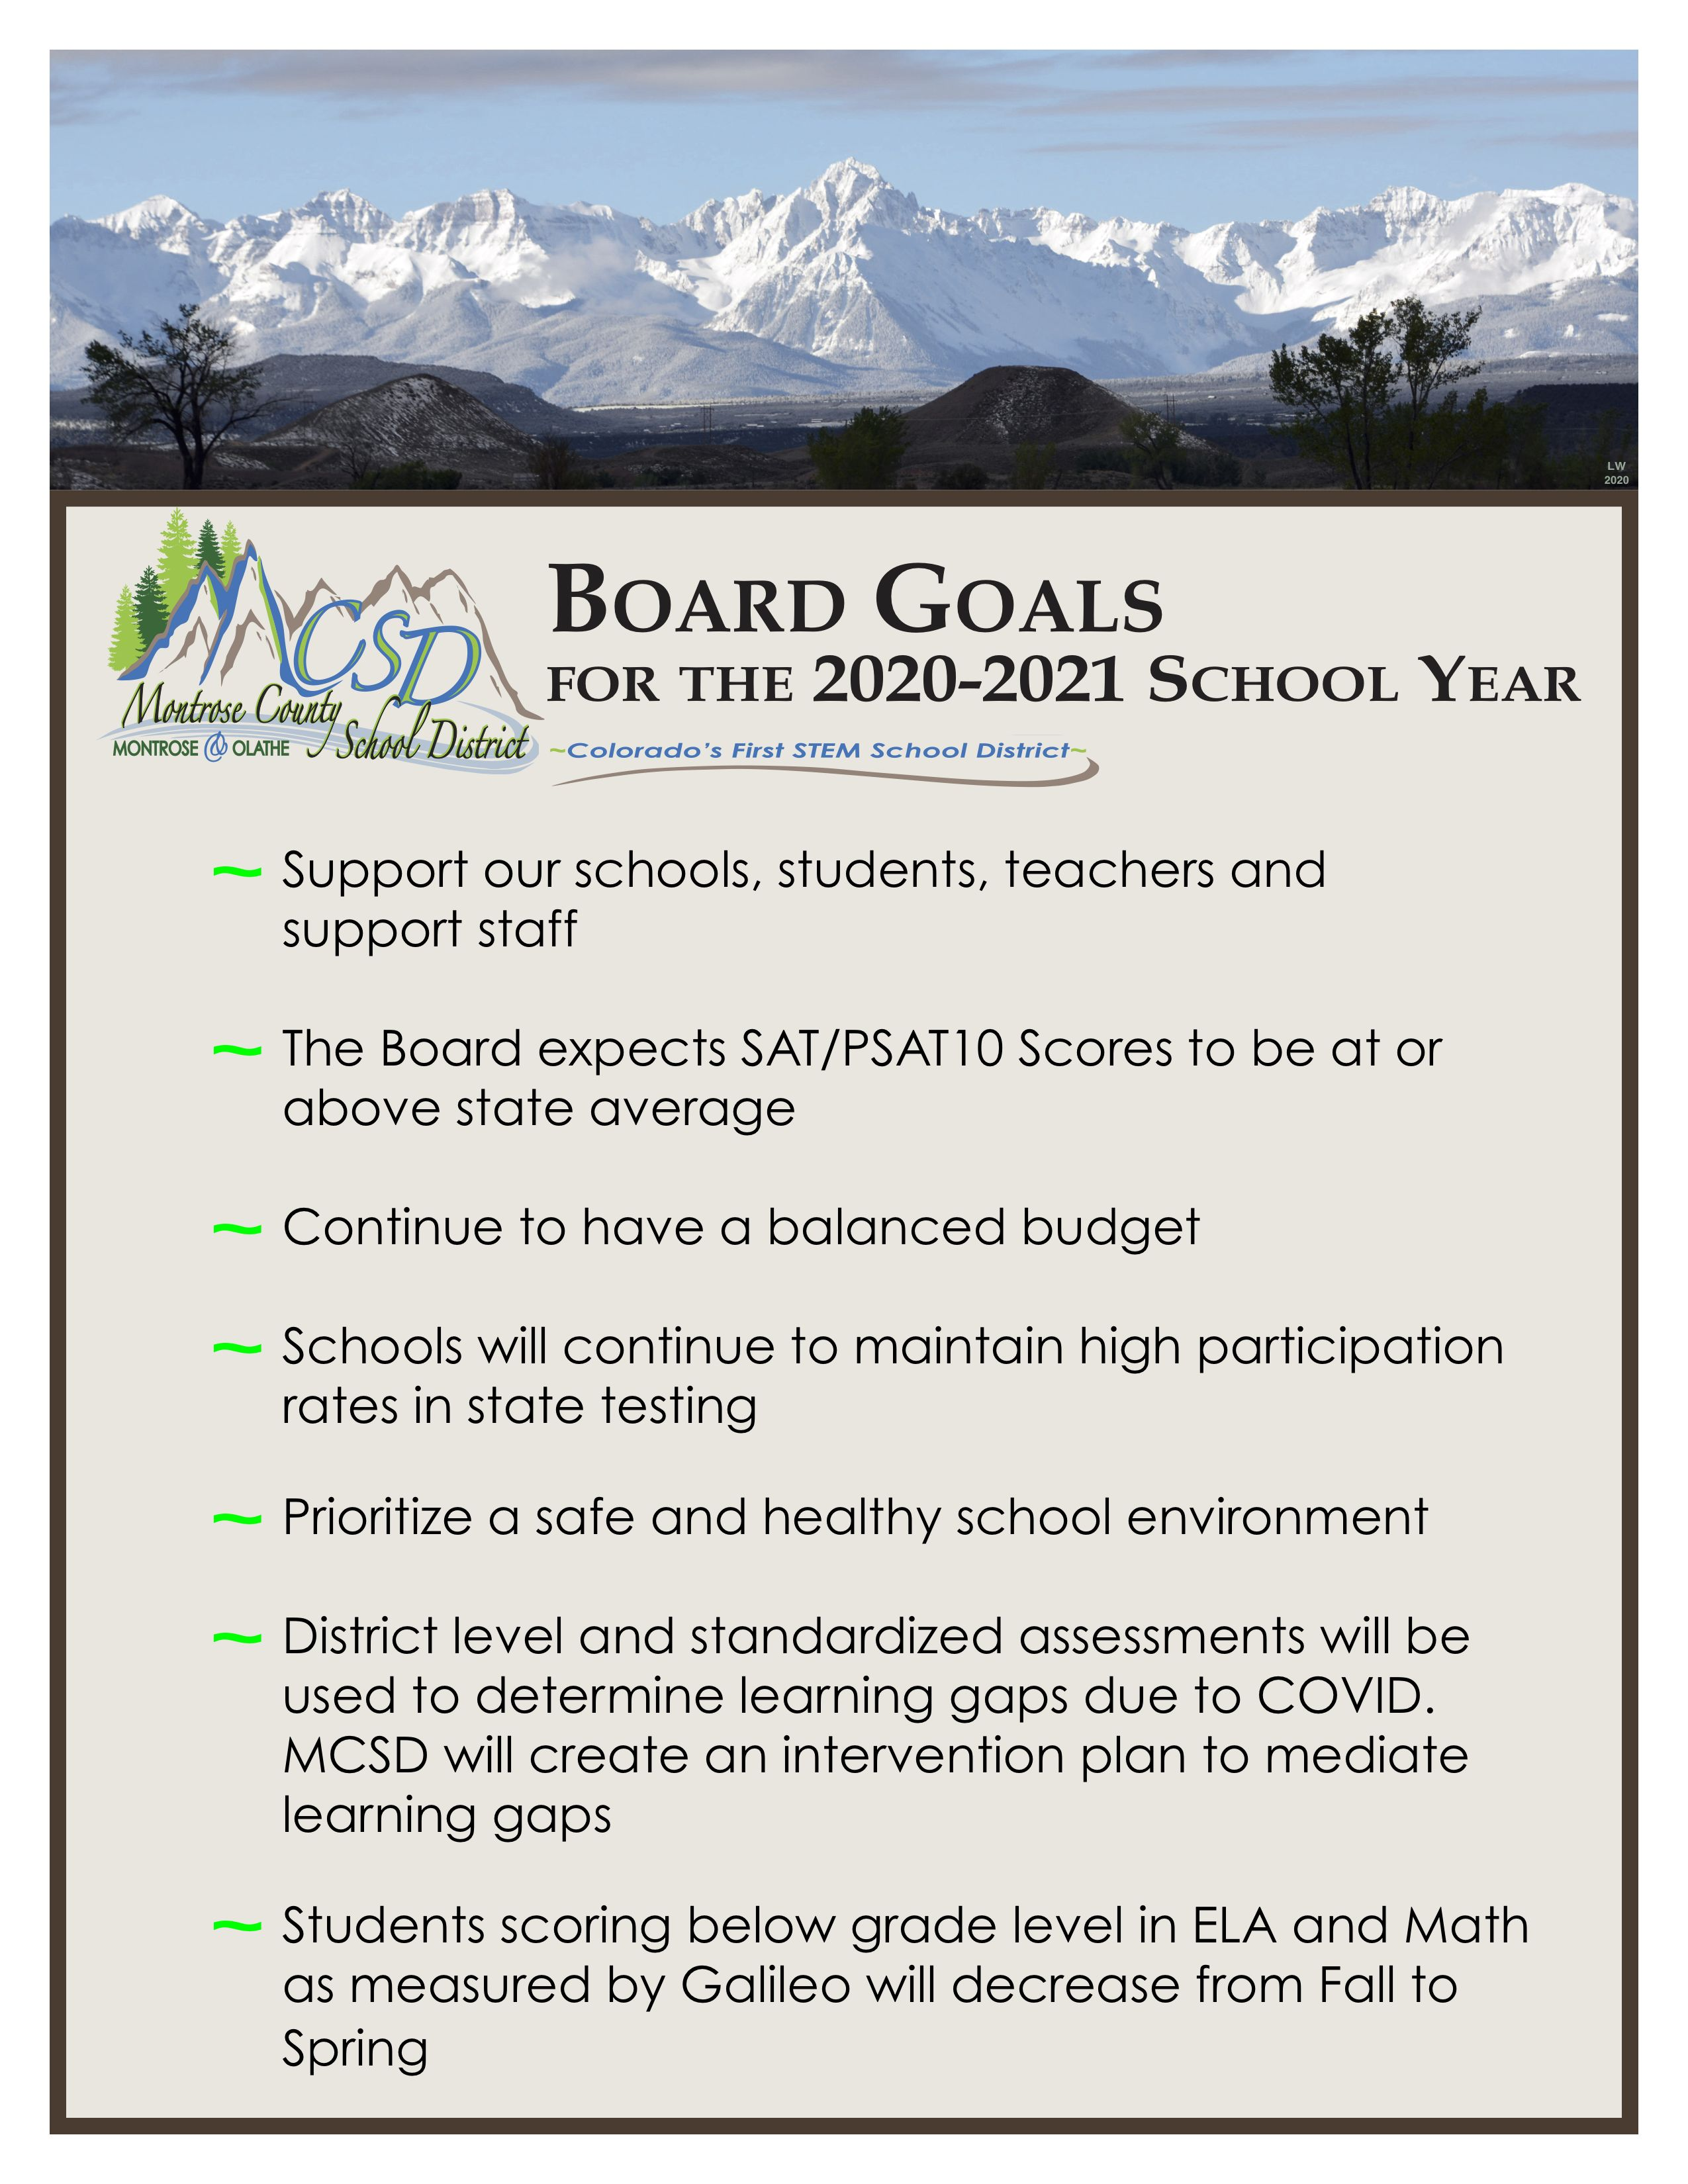 2020-2021 Board Goals